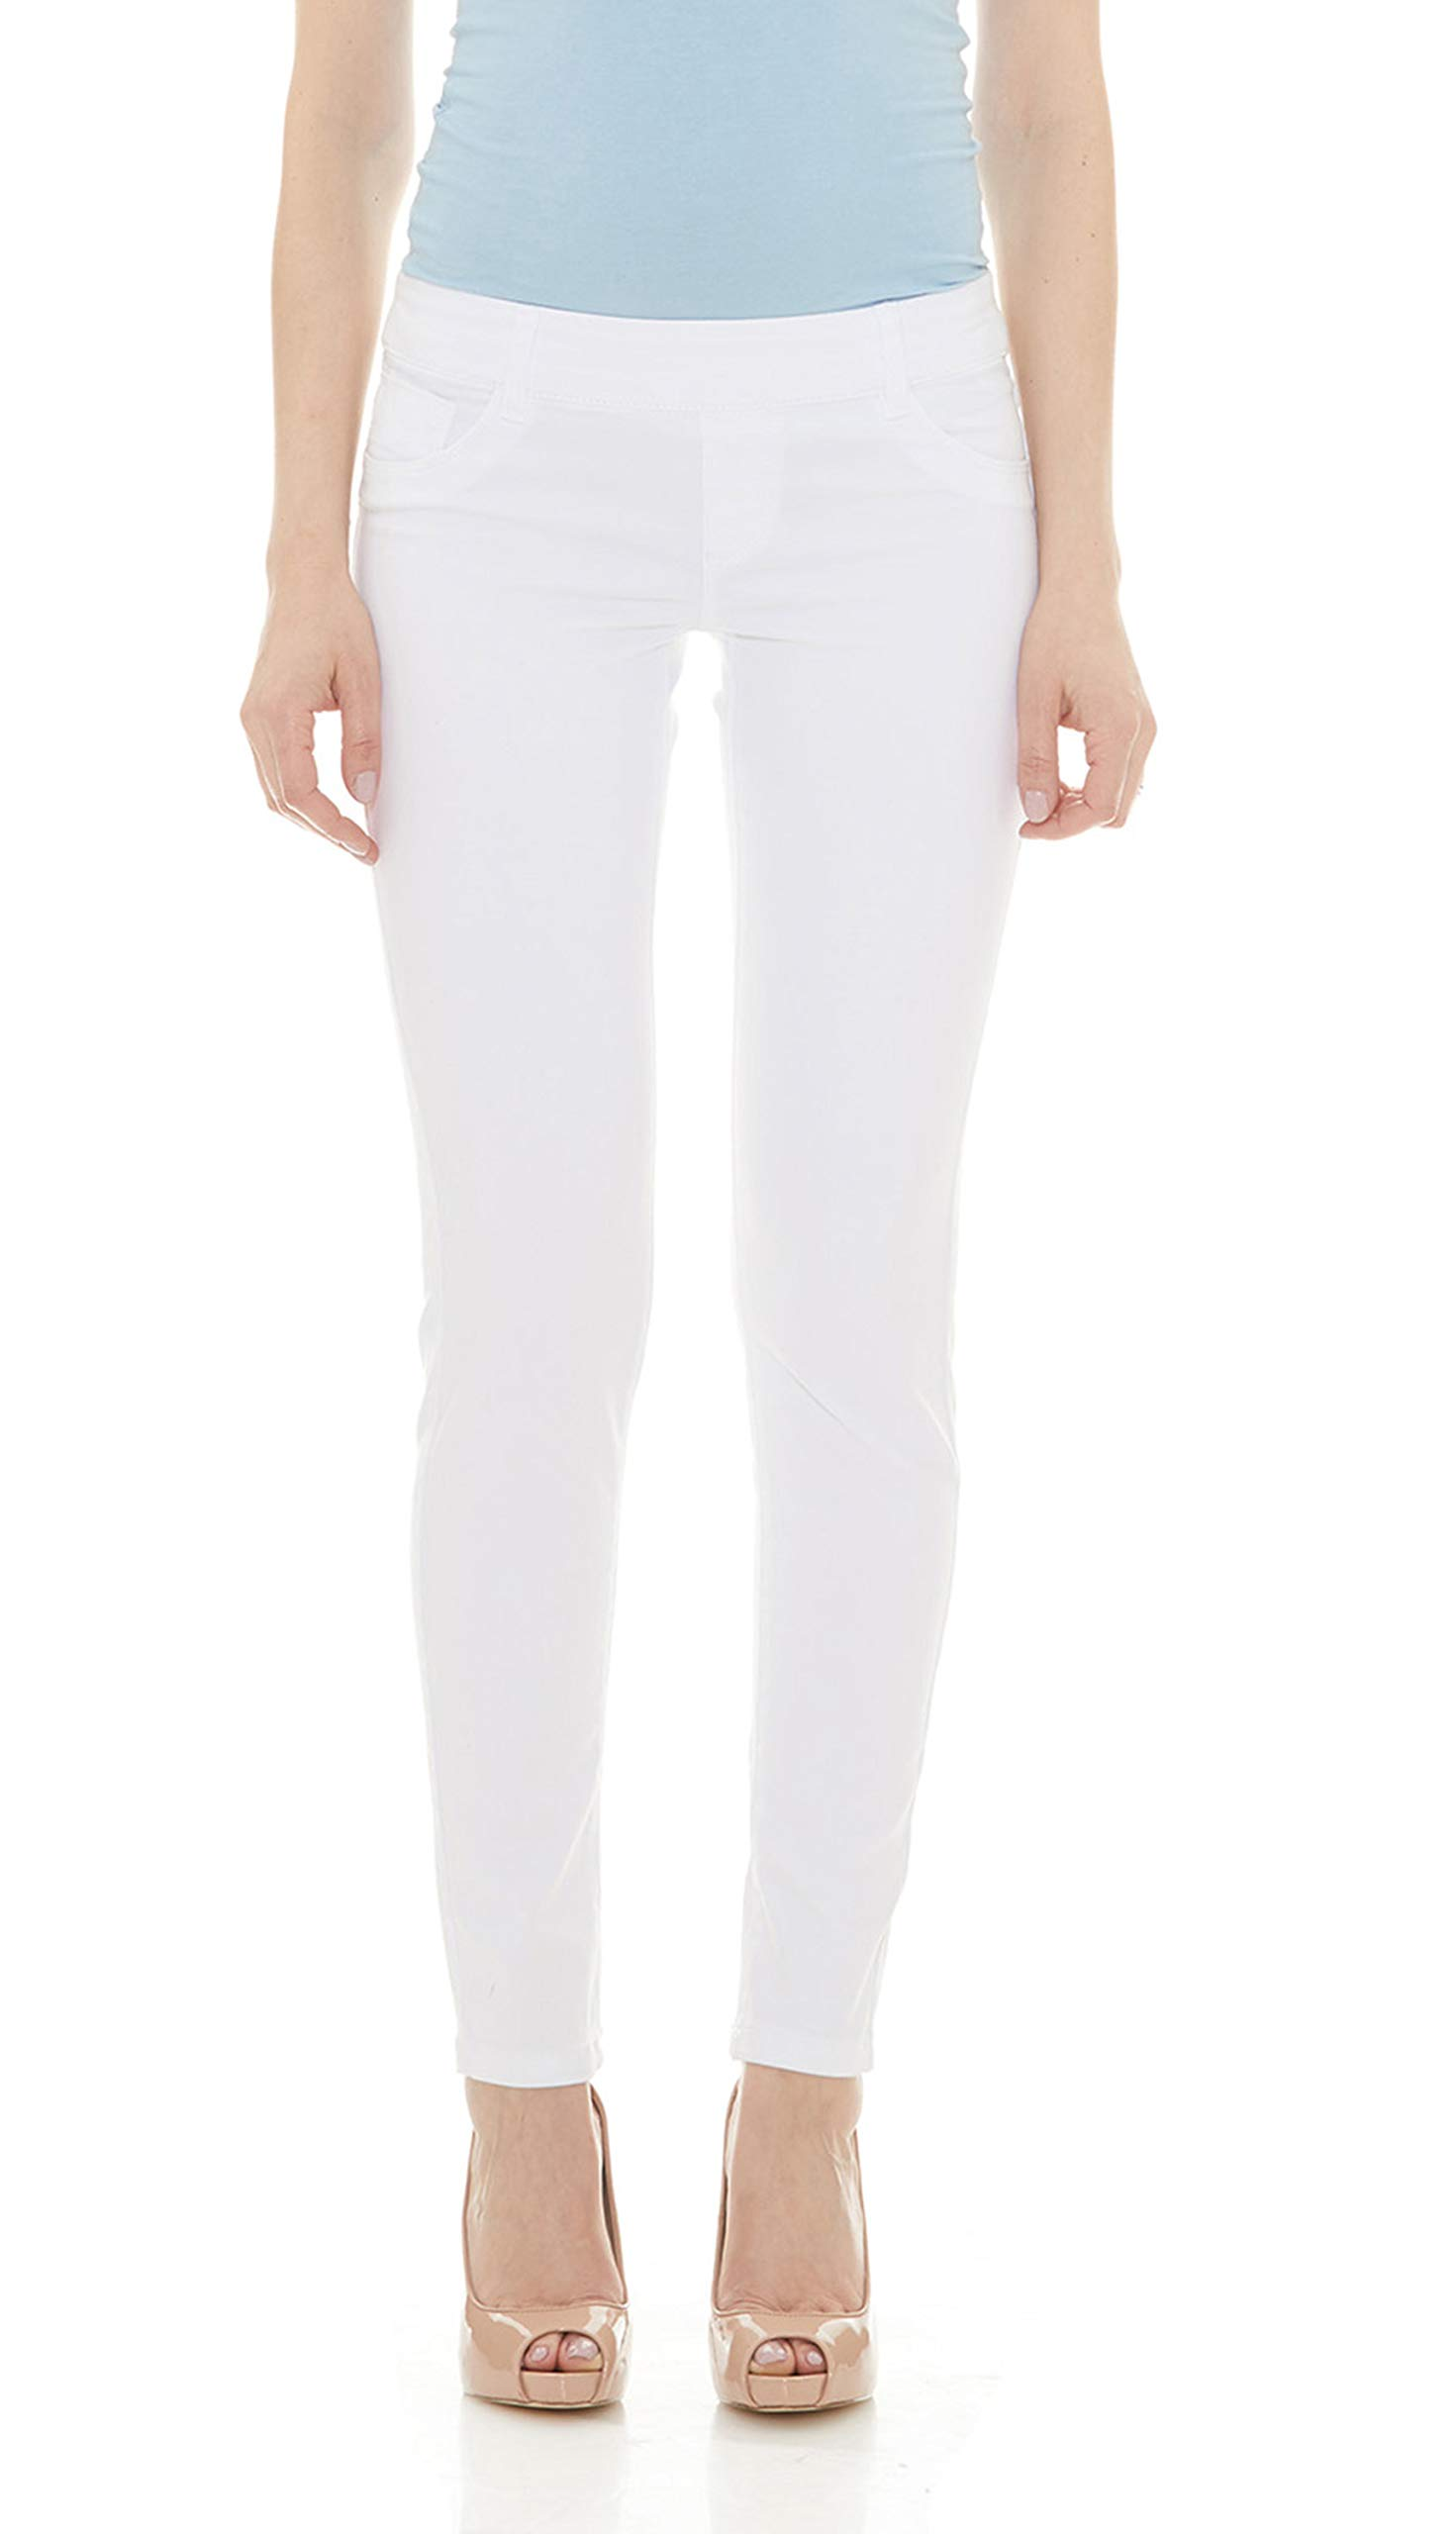 f1b60e17 Suko Jeans Women's Skinny Pants Pull On Jean Stretch Denim product image